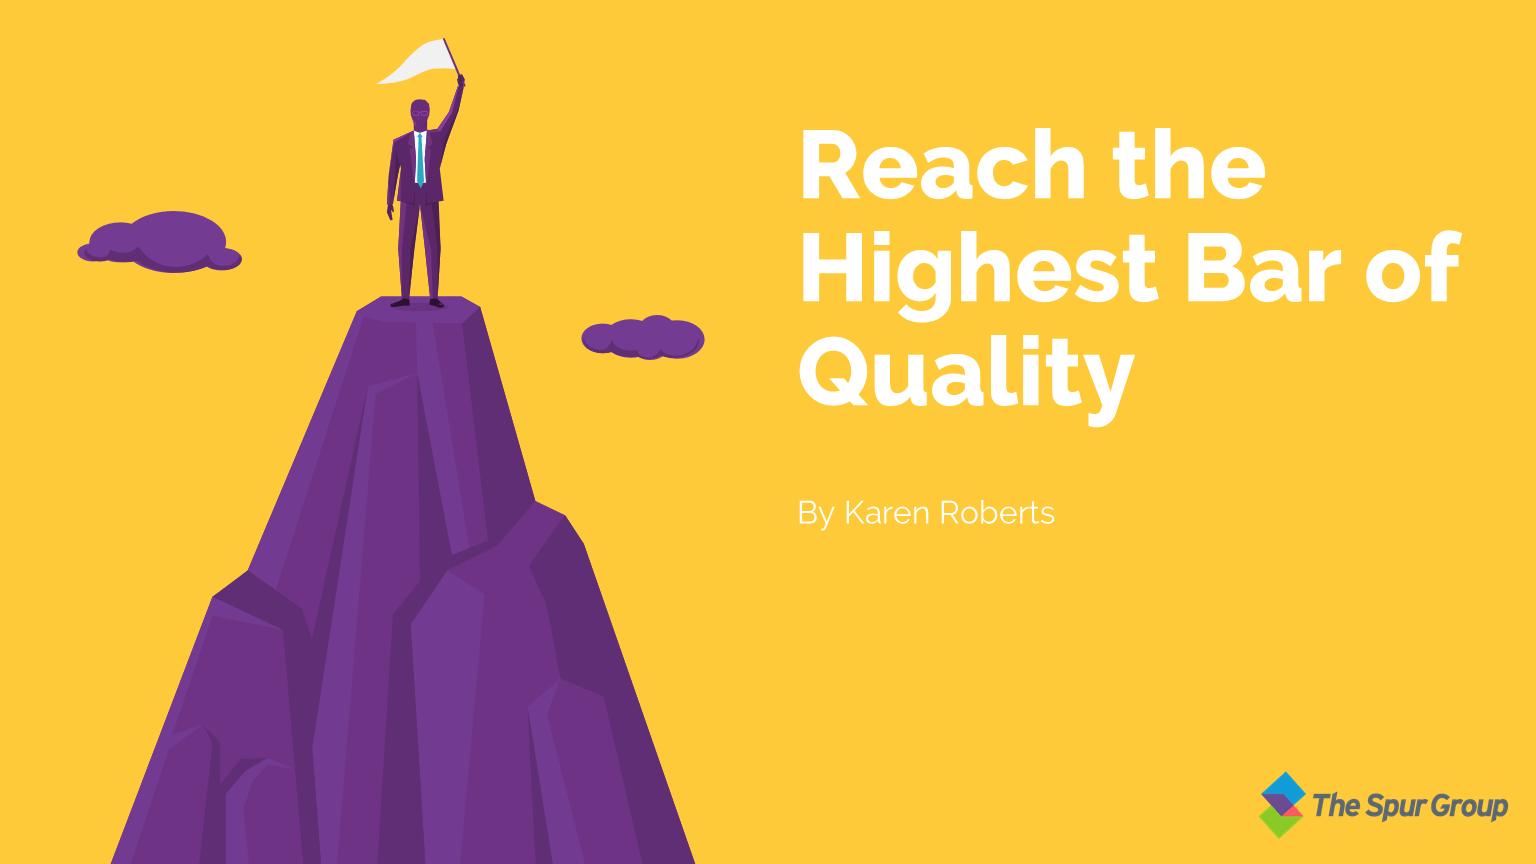 Reach the Highest Bar of Quality